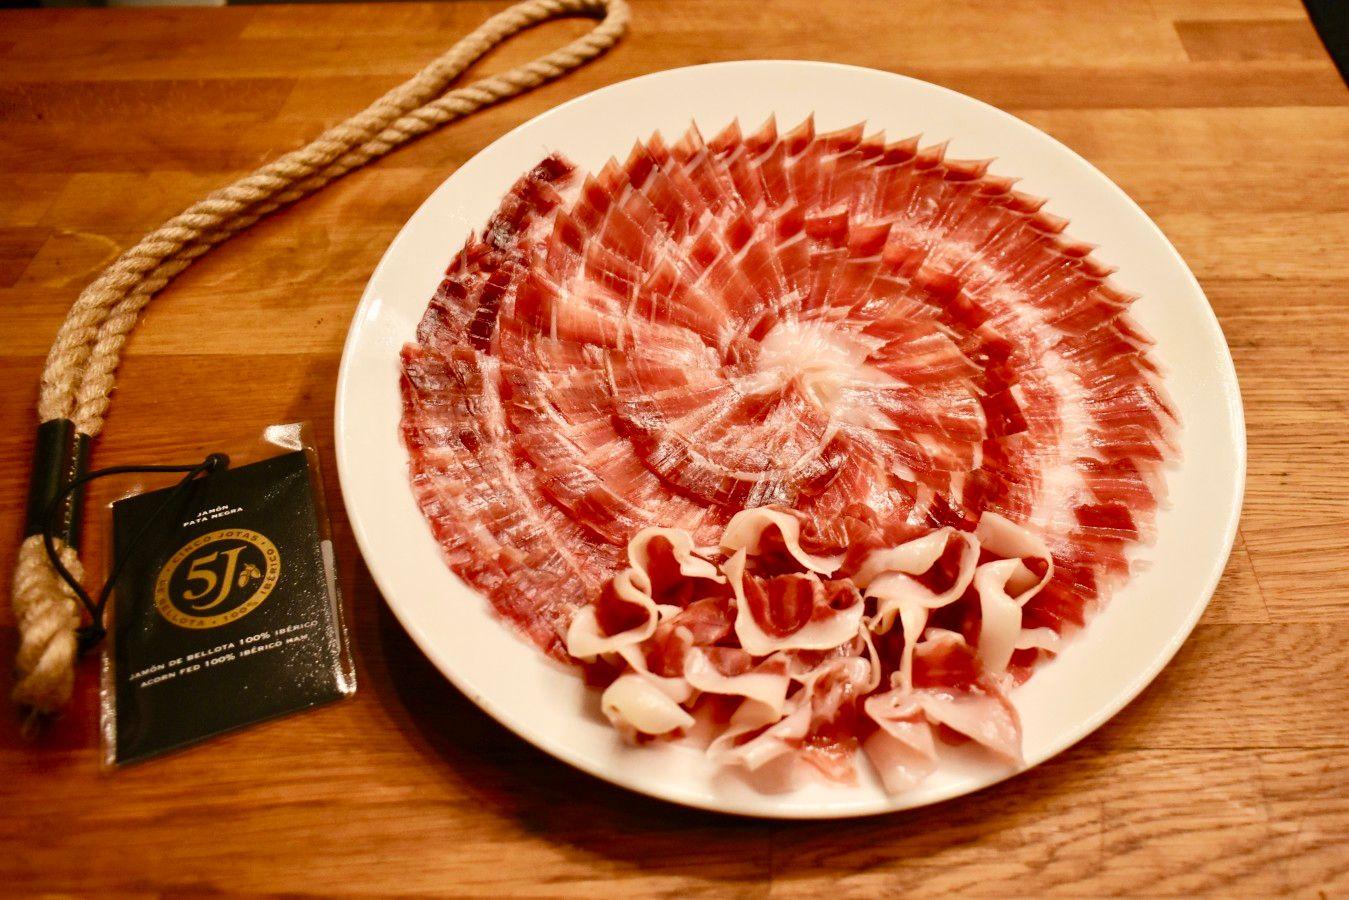 Cinco Jotas Iberico Ham 100% Acorn-fed